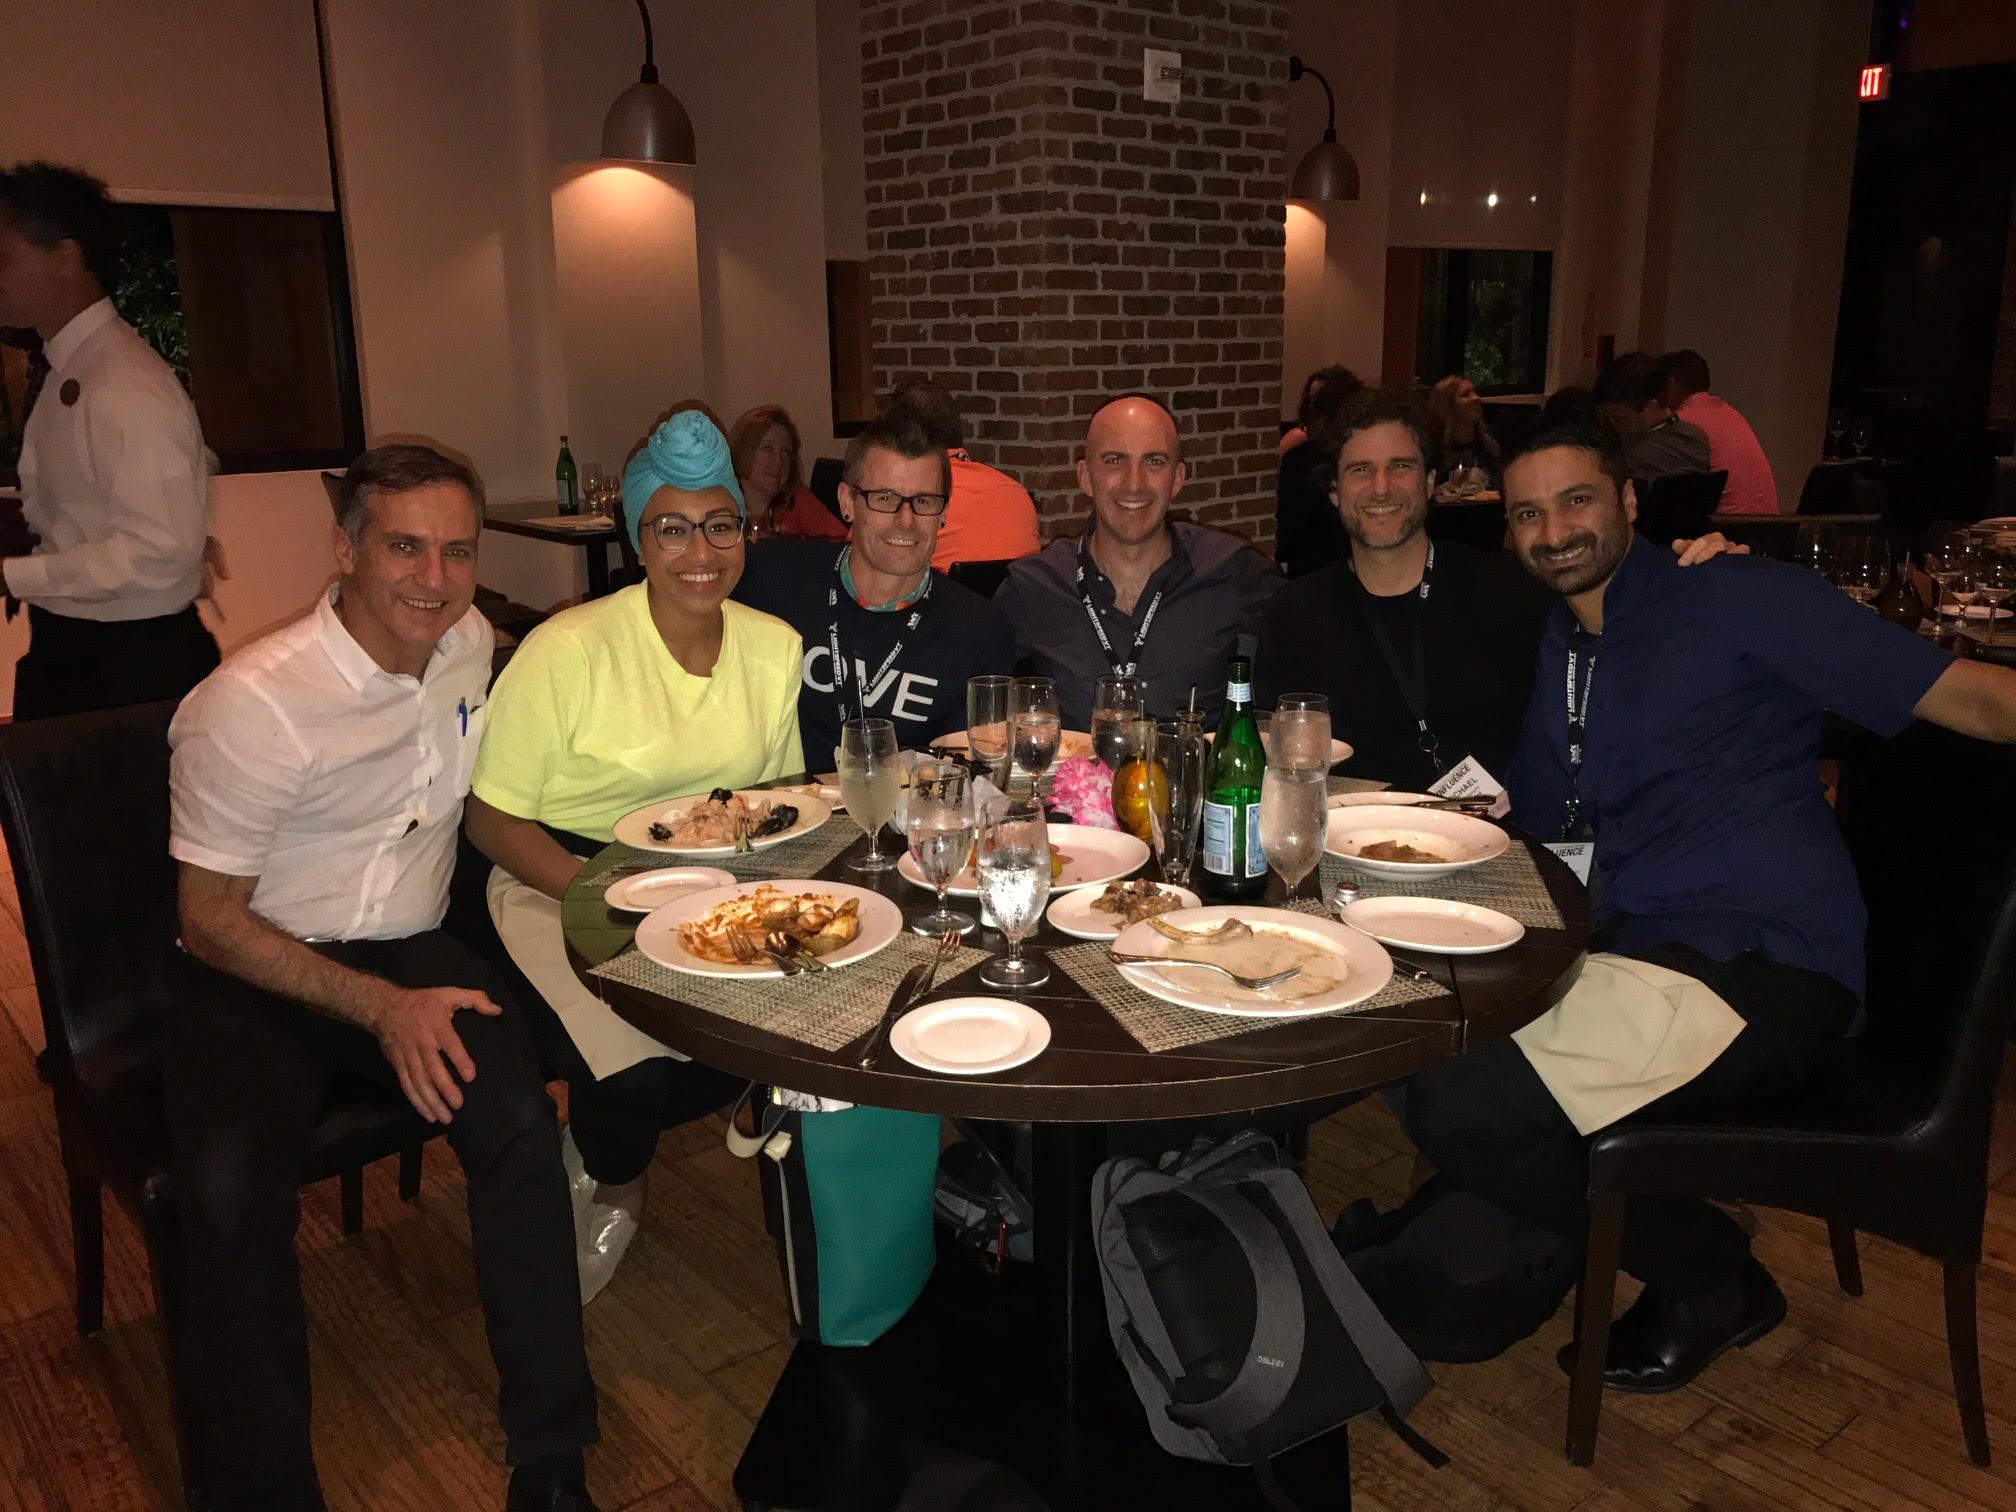 Dinner with: Left to right: Demian Coorey (Futurist Speaker) , Yassmin Abdul-Magied (Activist), Travis Bell (Bucket Lists), Tim Longhurst (Futurist), Michael Margolis (Anthropologist), Sam Cawthorn (Speakers Institute)